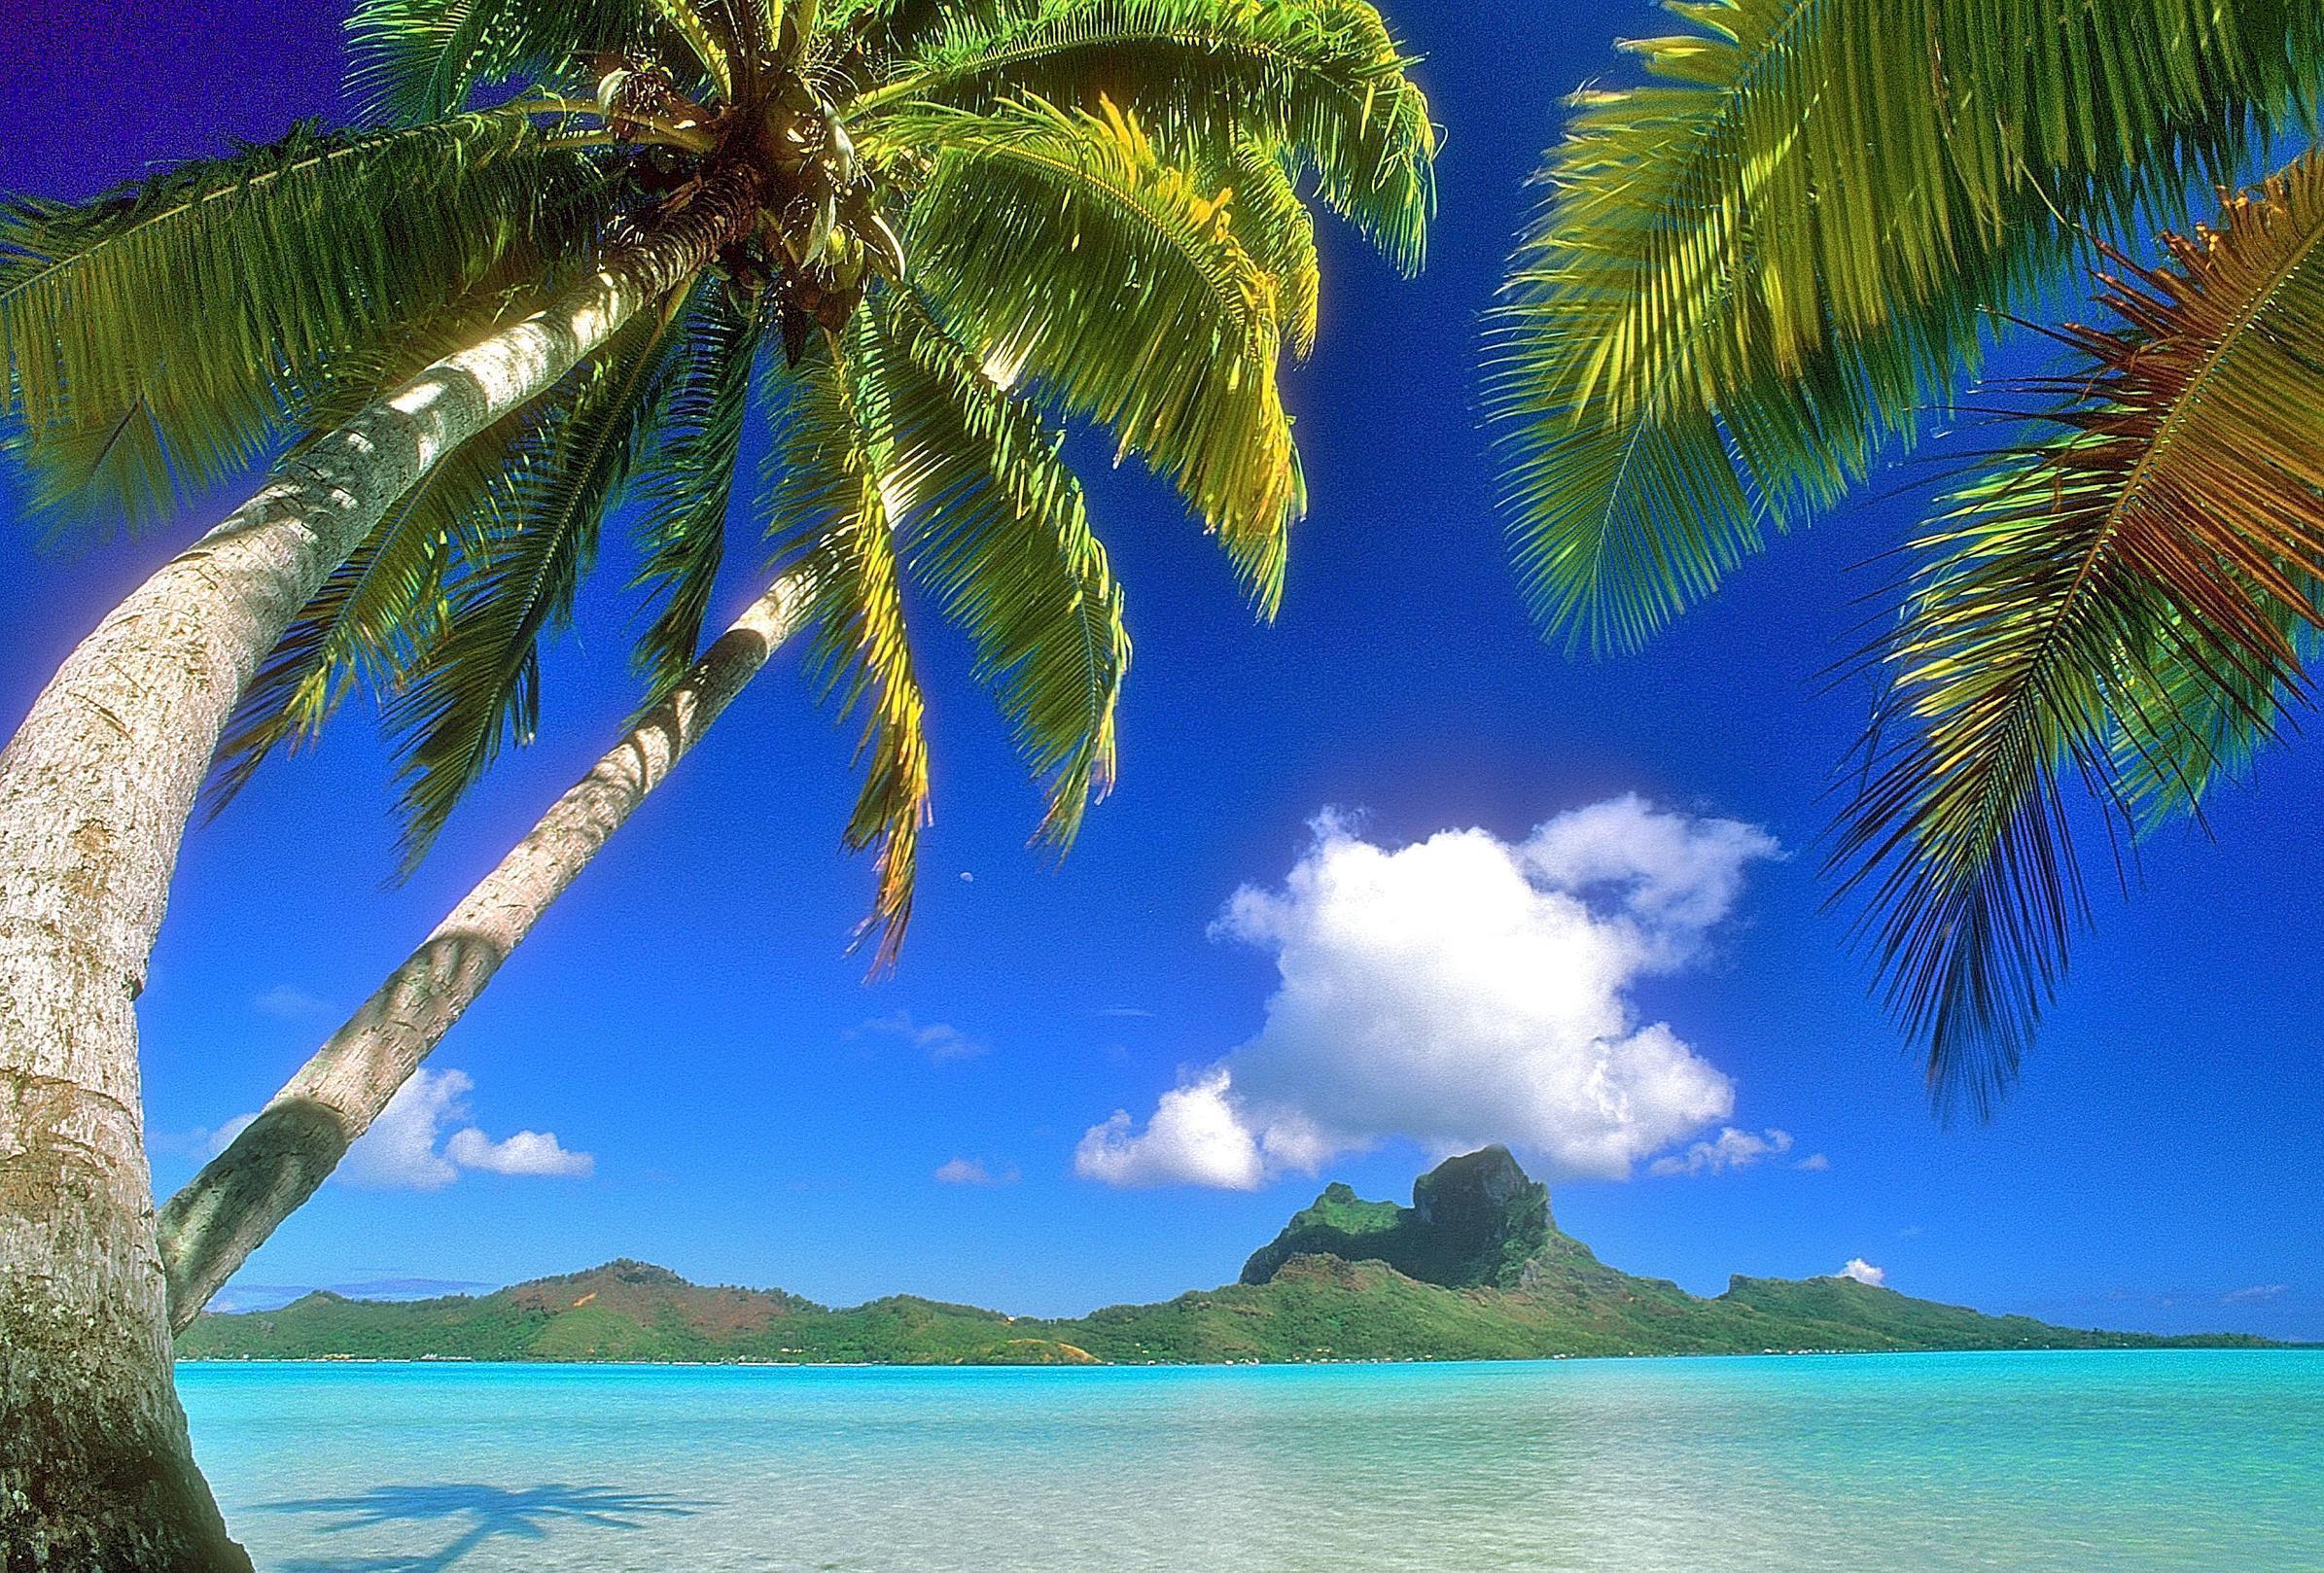 hawaiian backgrounds image wallpaper cave